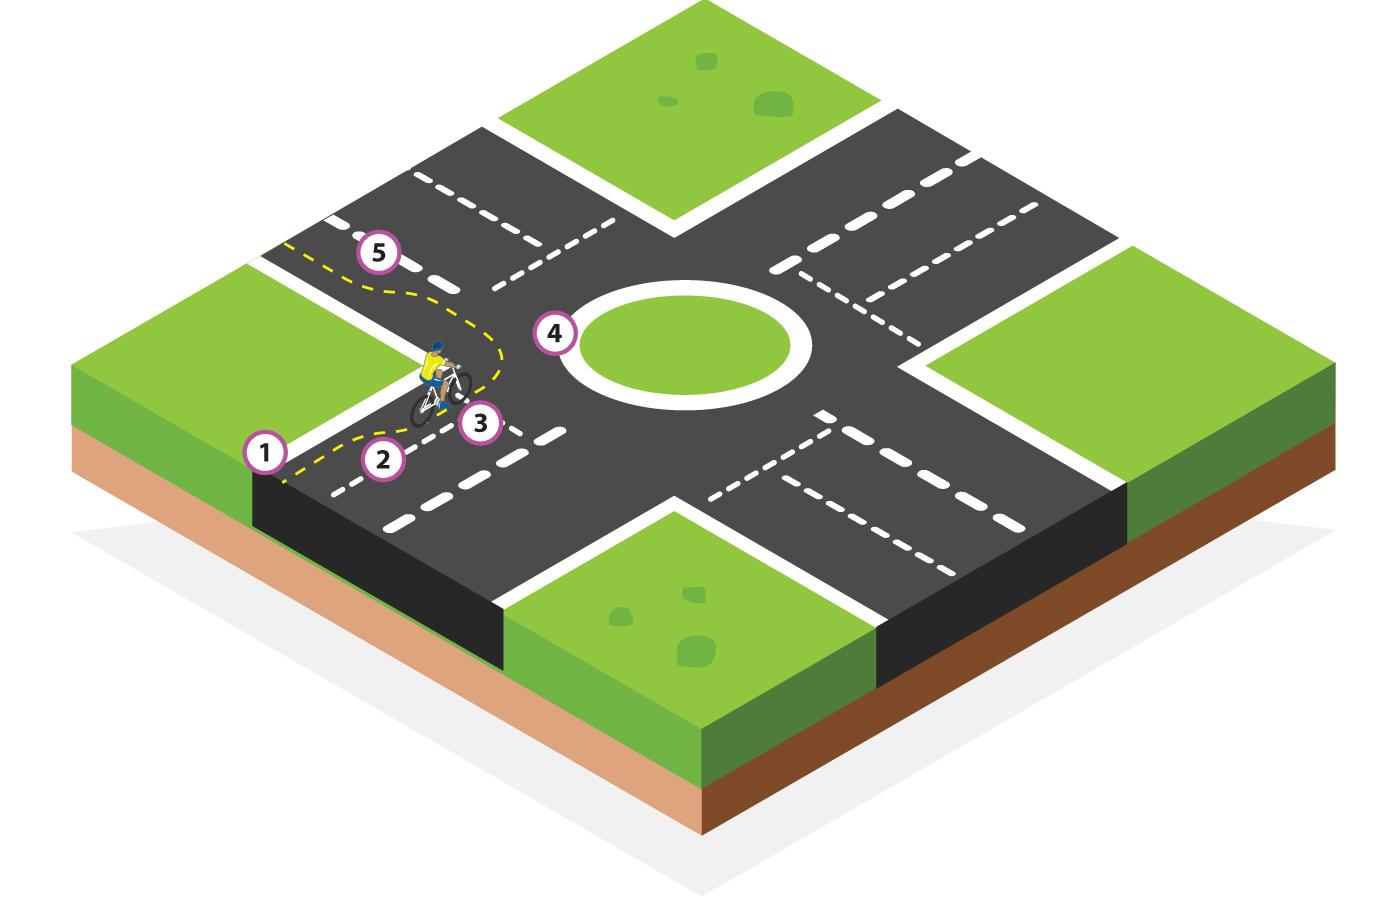 Roundabout dual lane left turn